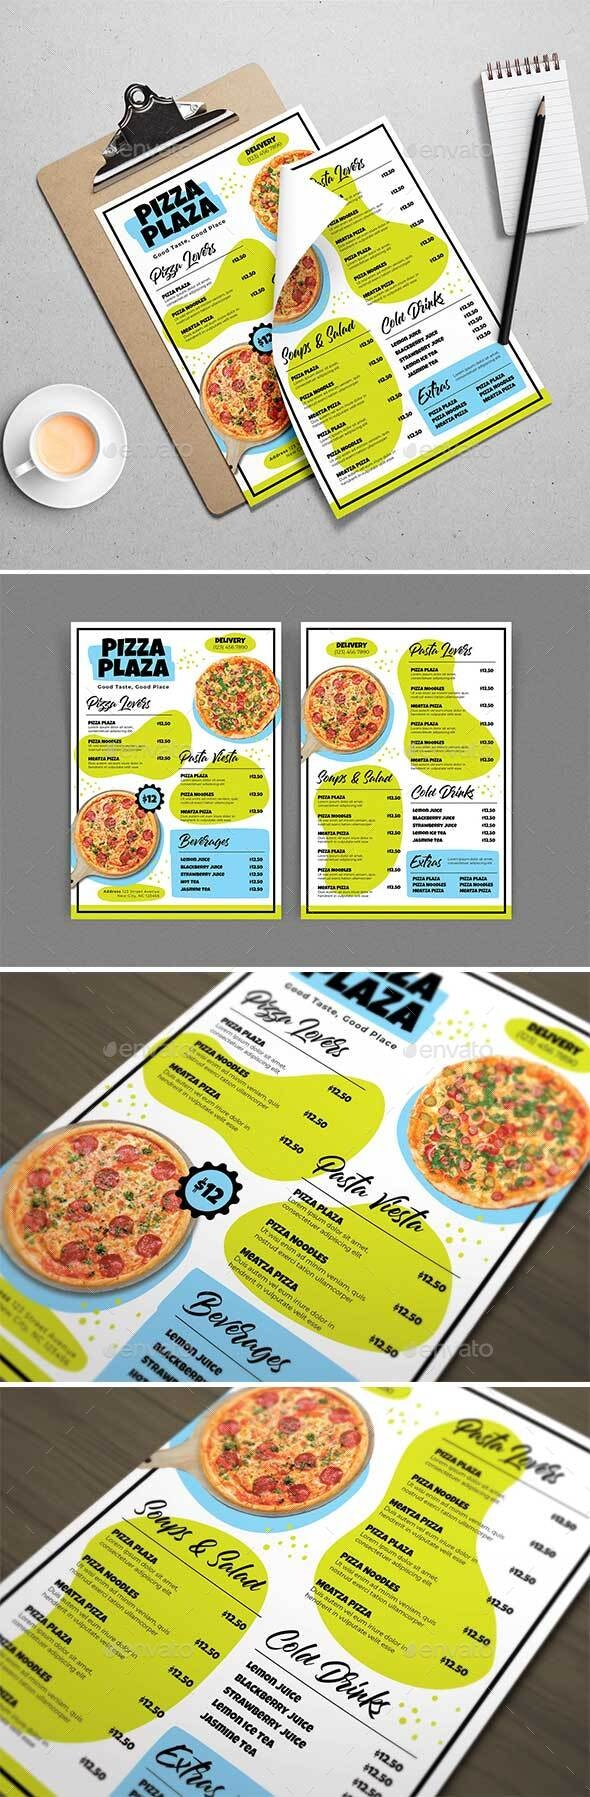 Pizza Plaza Menu Template - Food Menus Print Templates